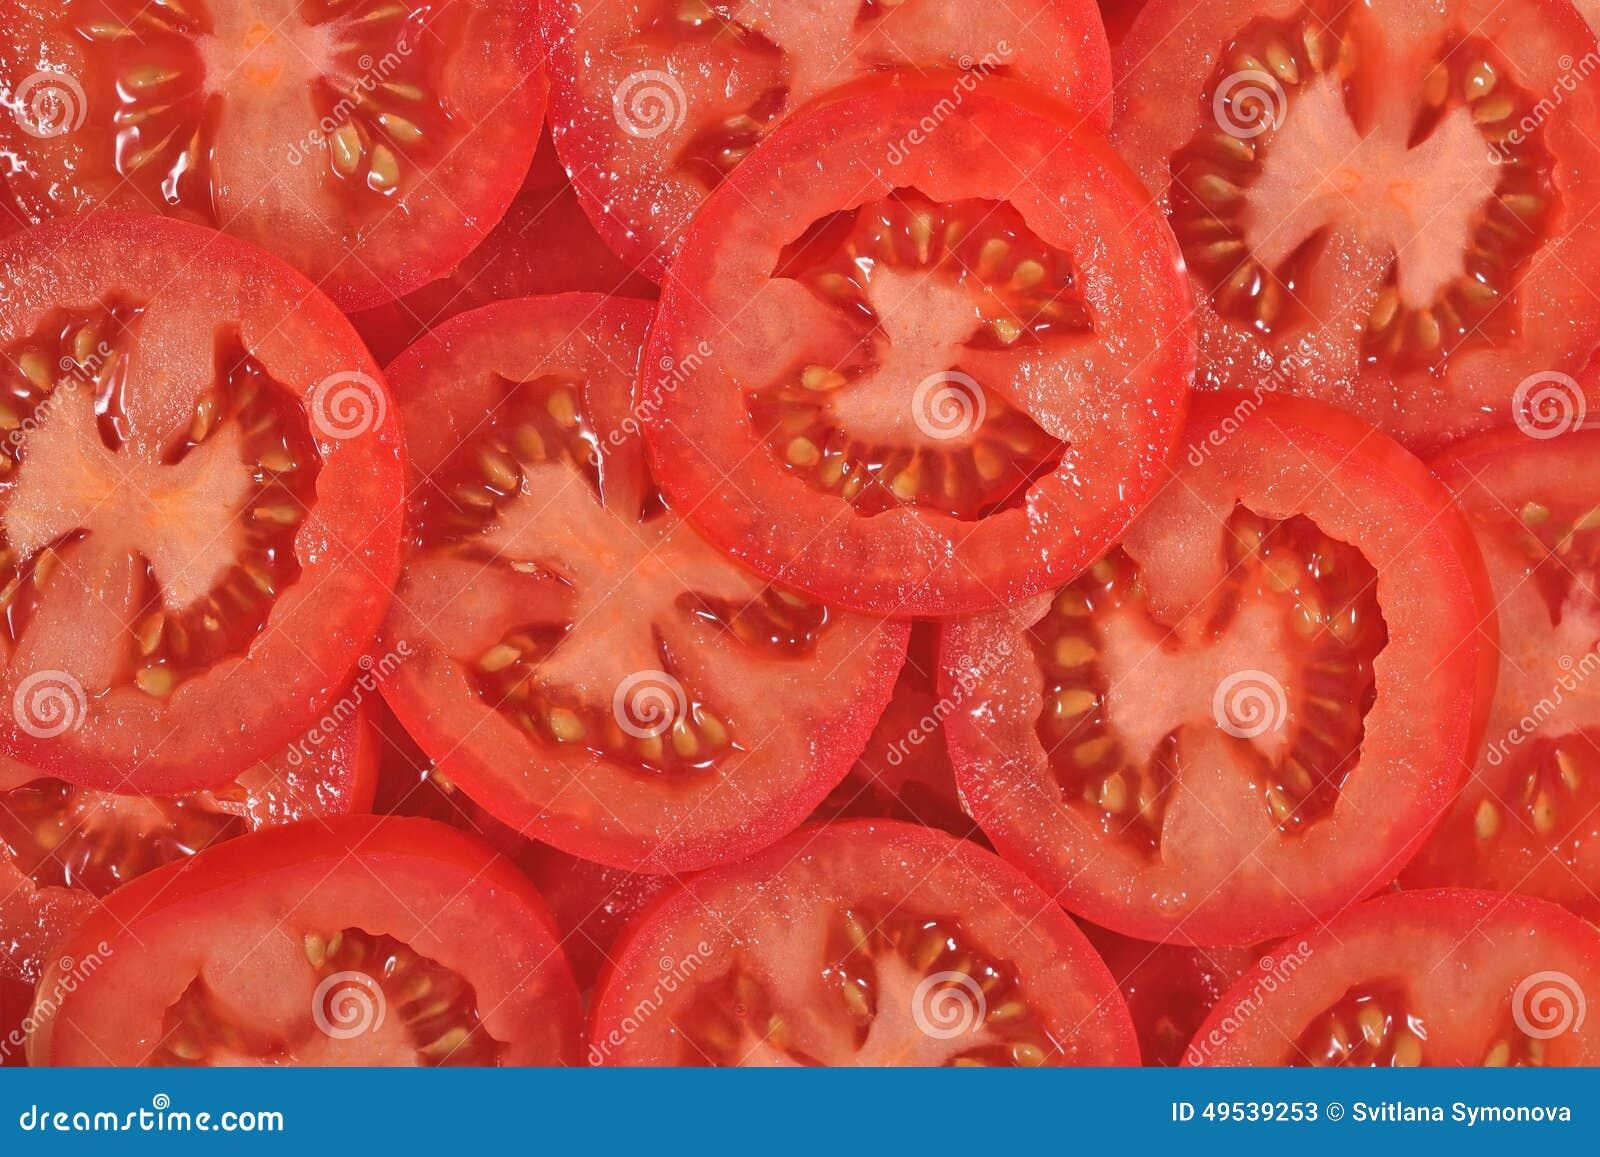 Tomato slices background